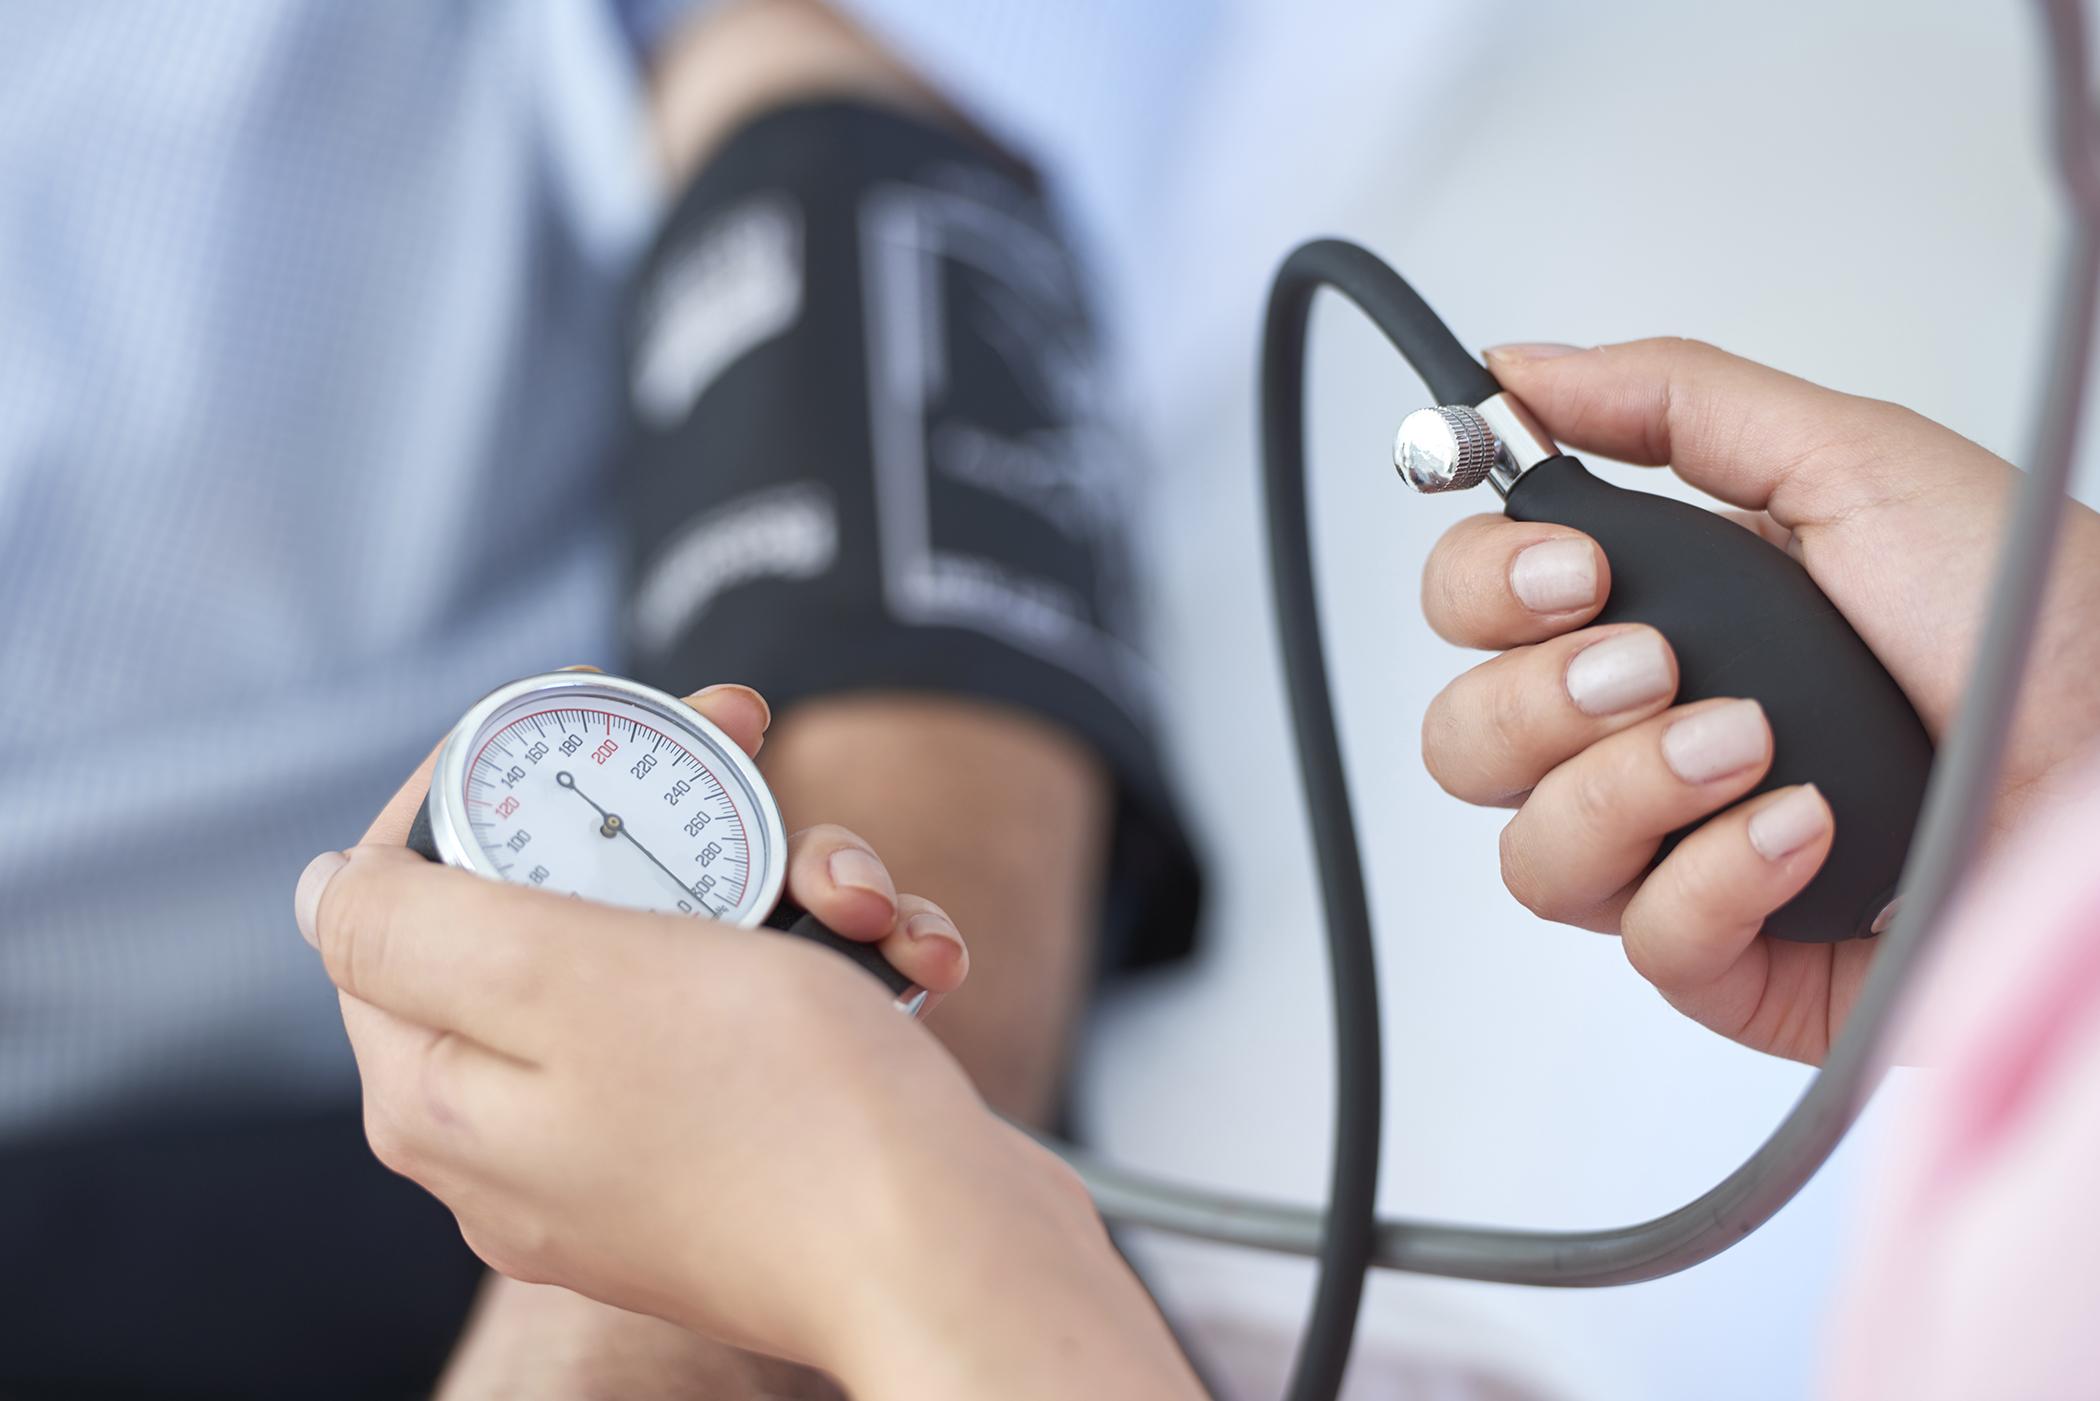 Controls Blood Pressure